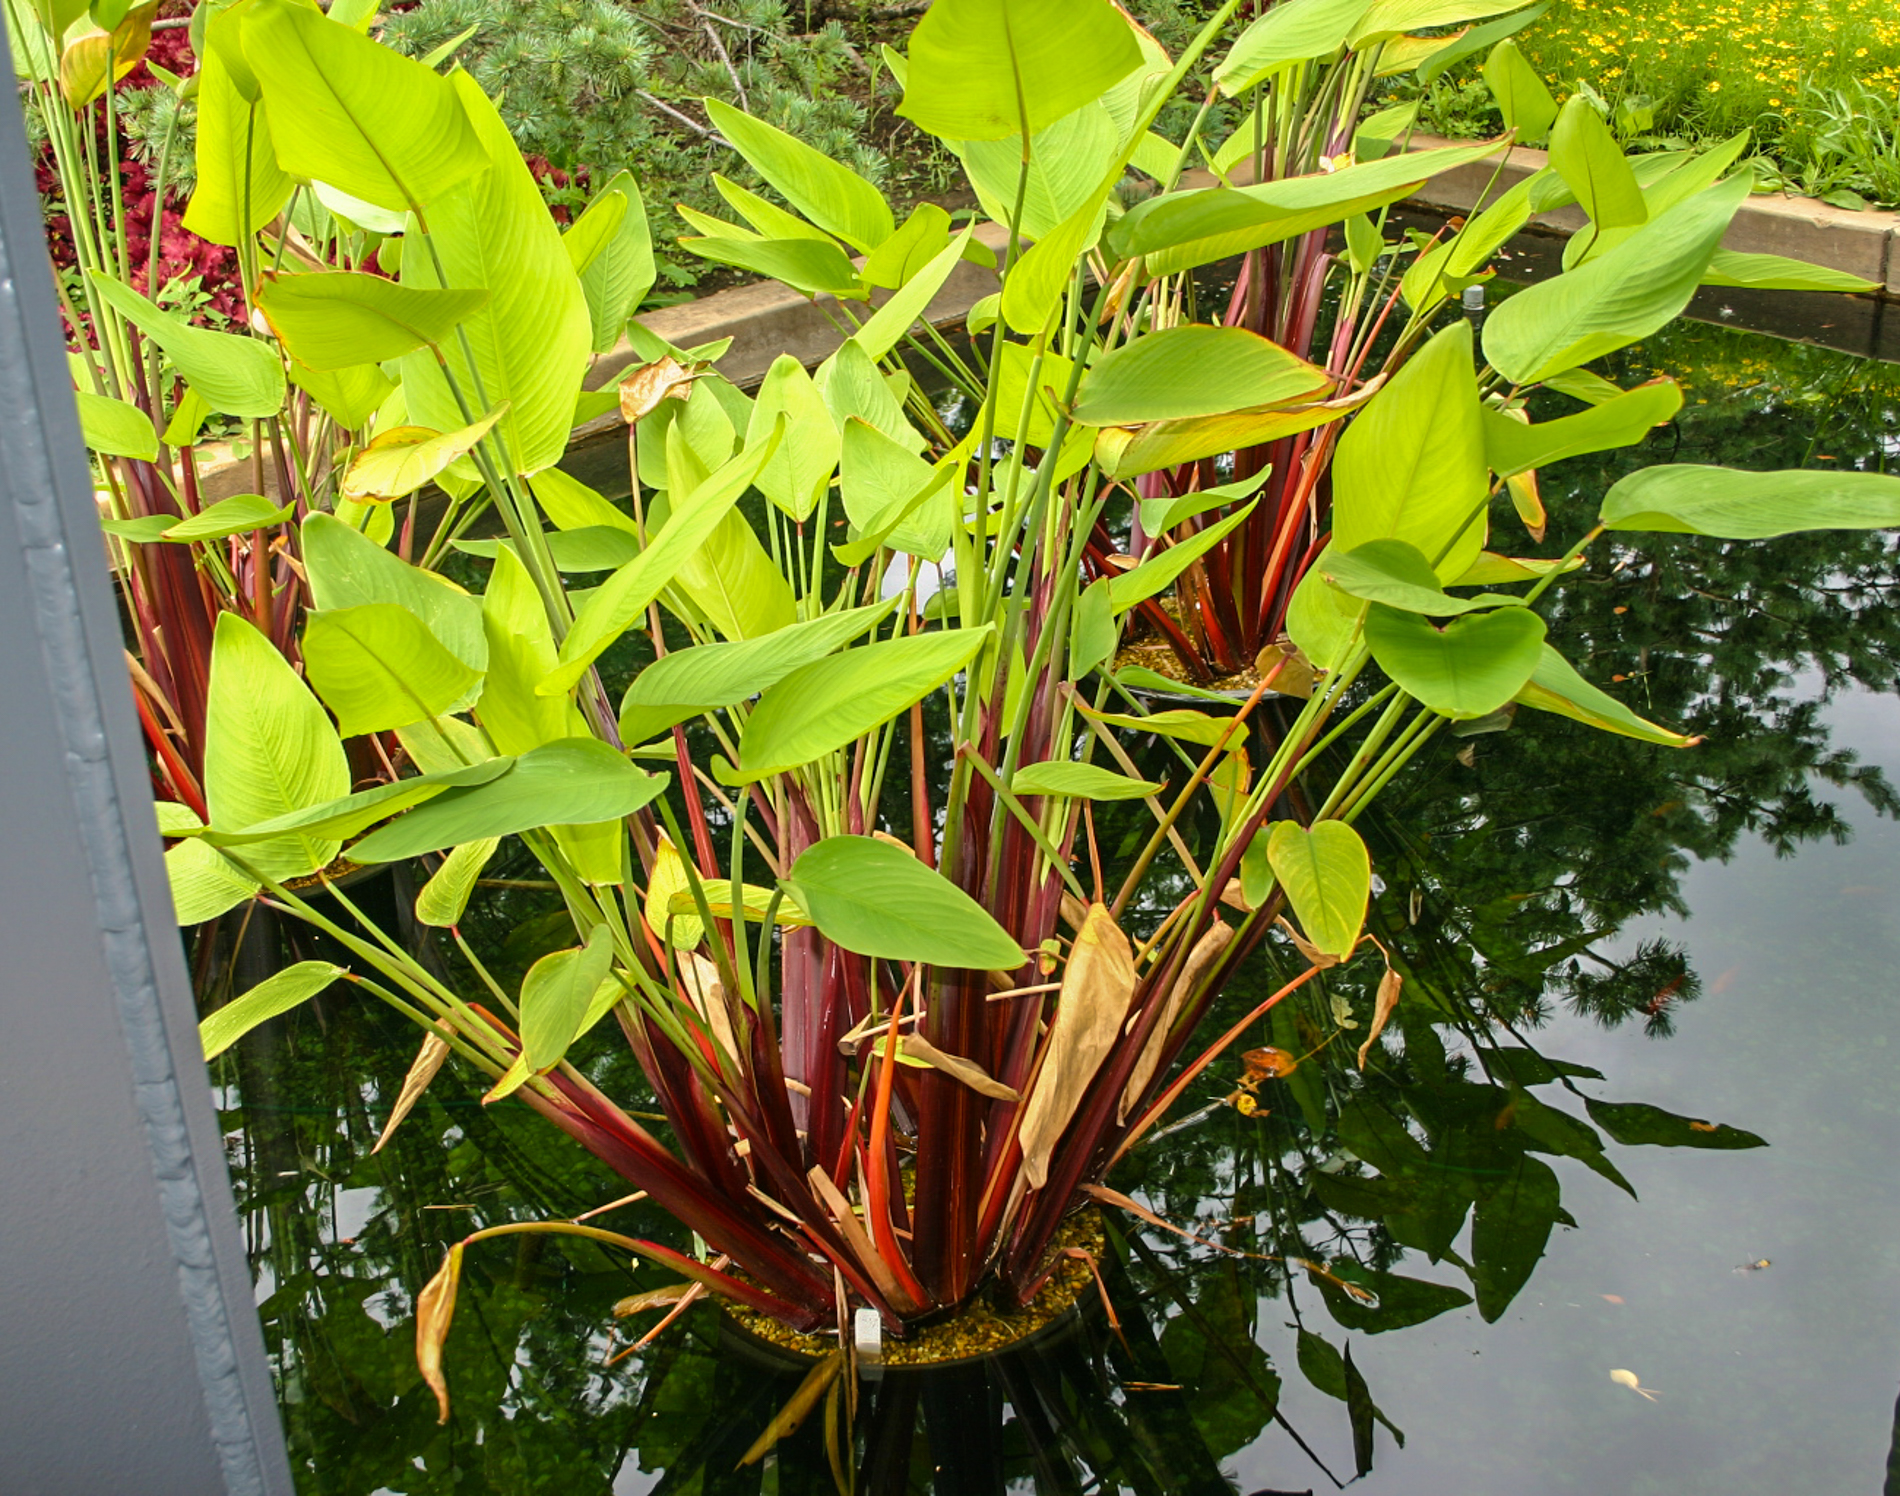 Red stem thalia 3 (1 of 1).jpg